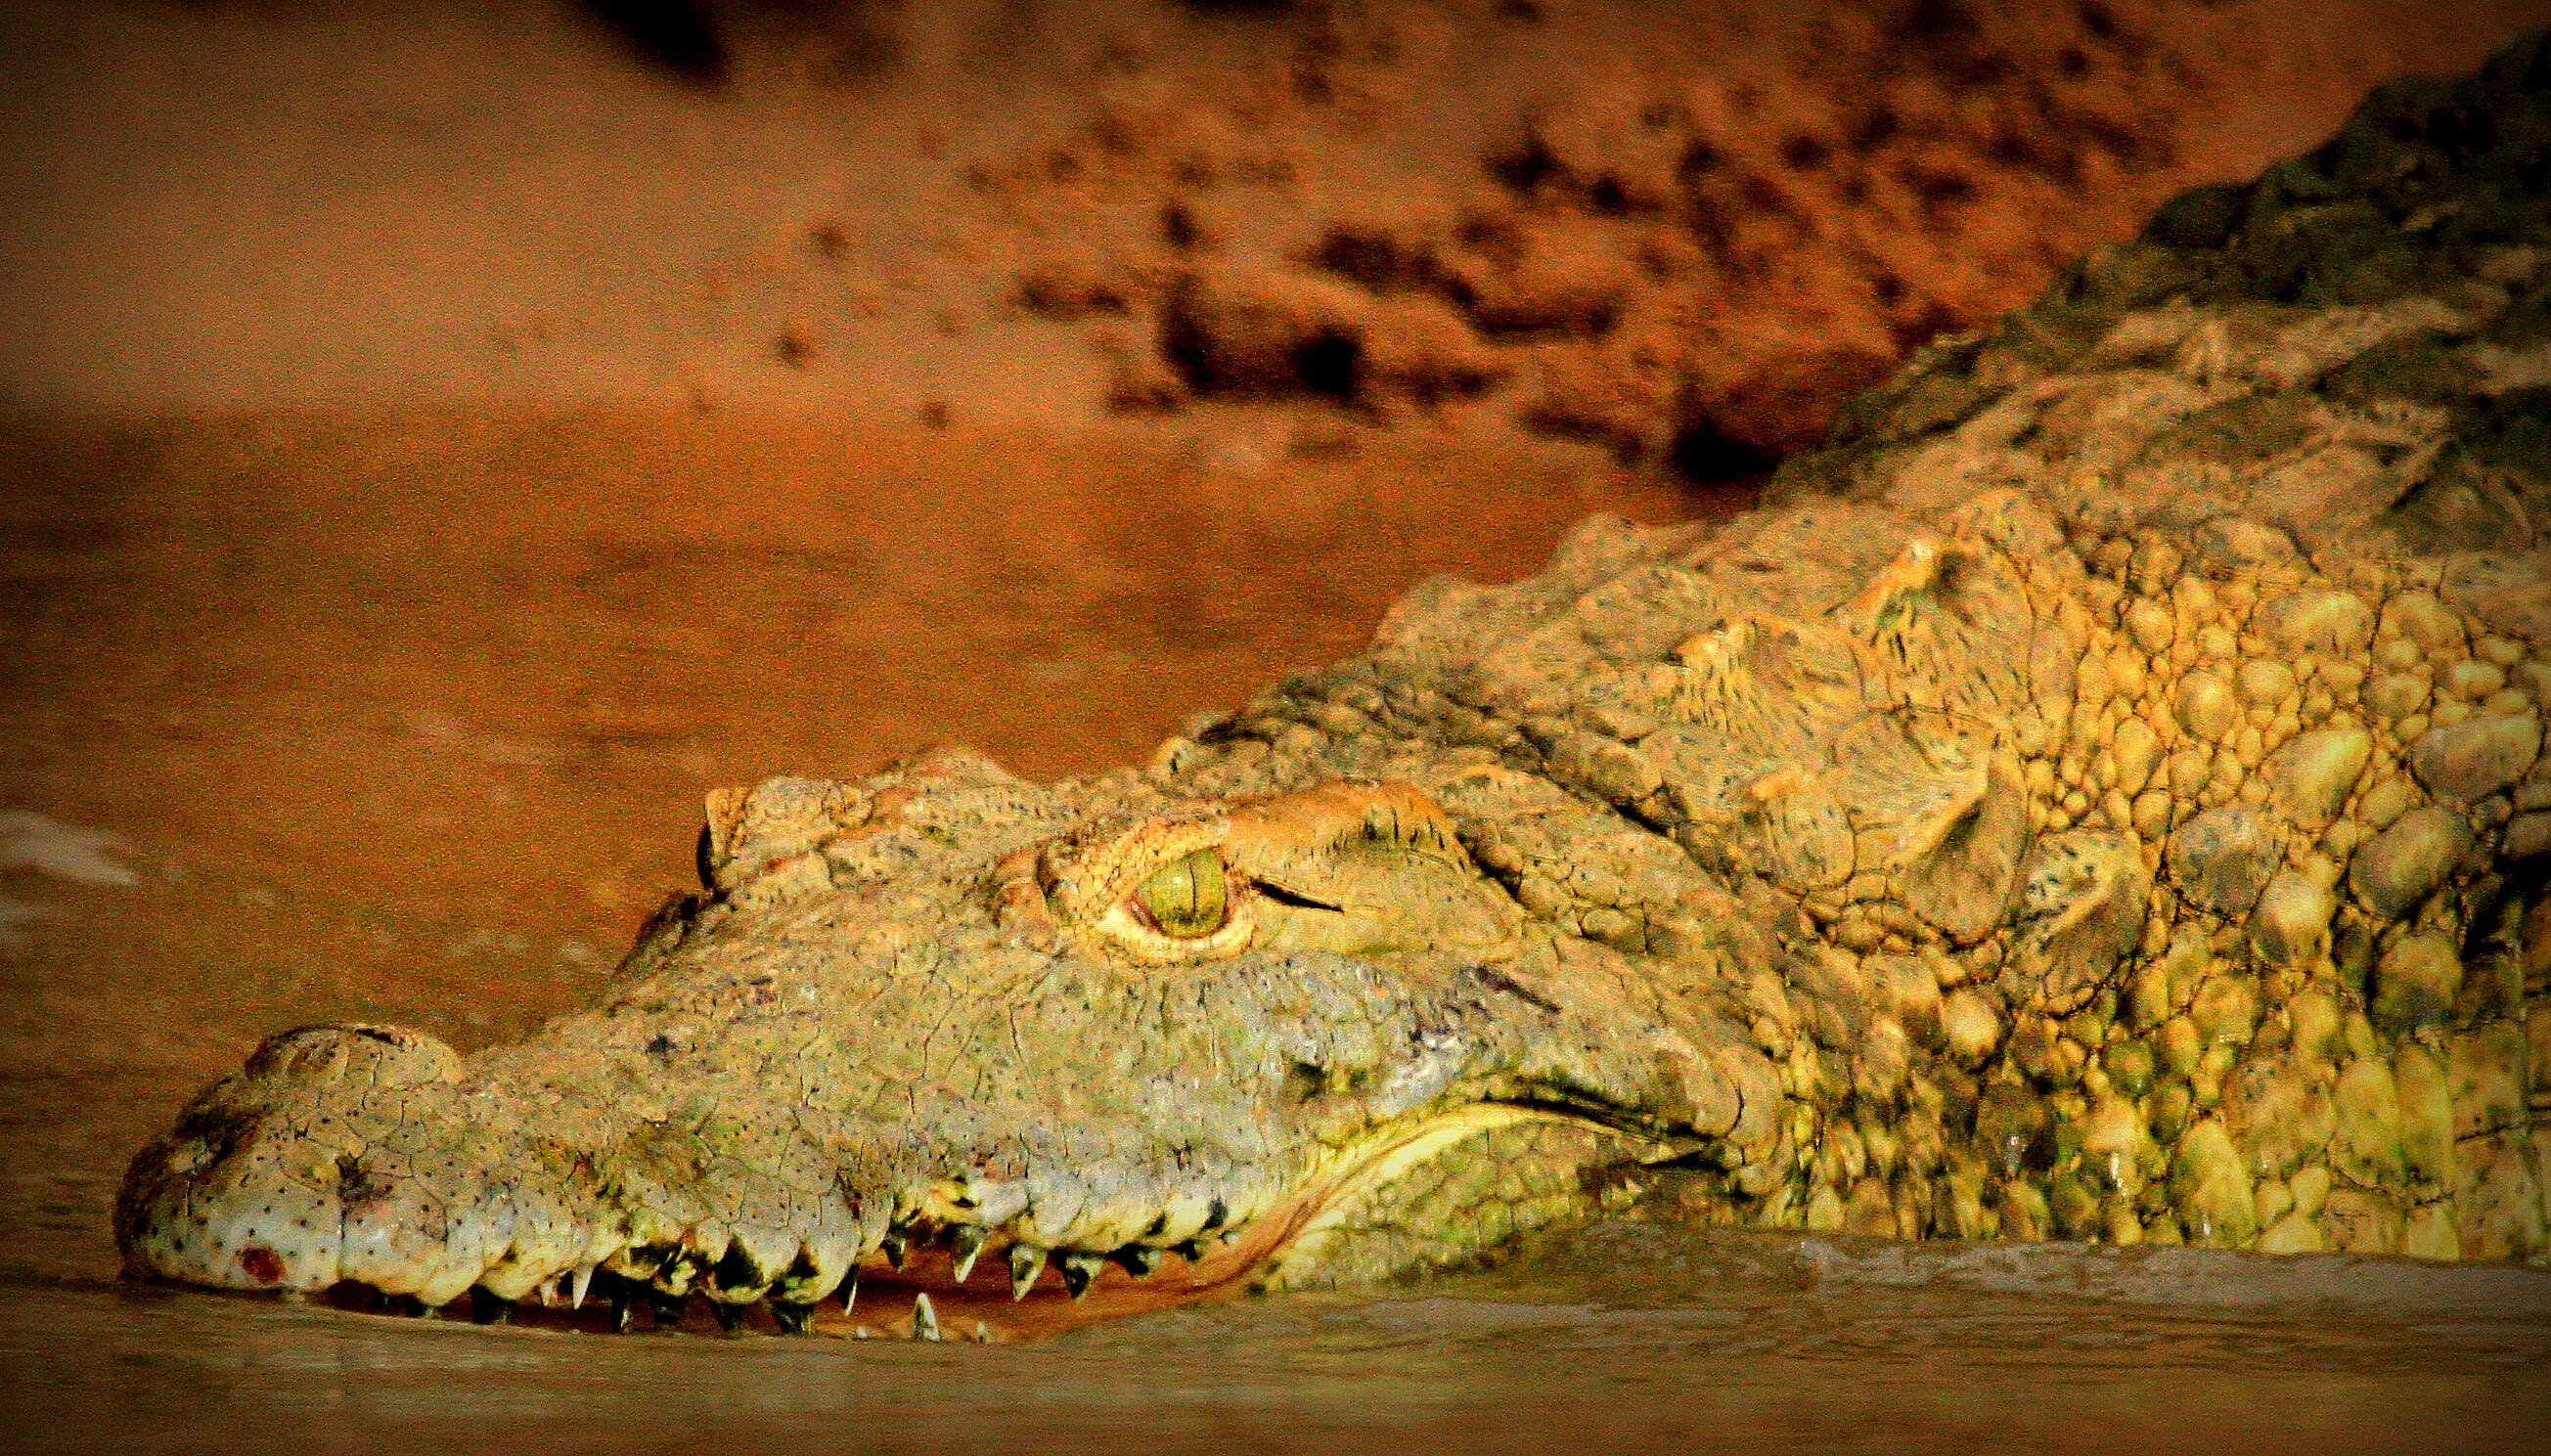 Kostenloses Stock Foto zu krokodil, krokodil auge, krokodil nahaufnahme, safari